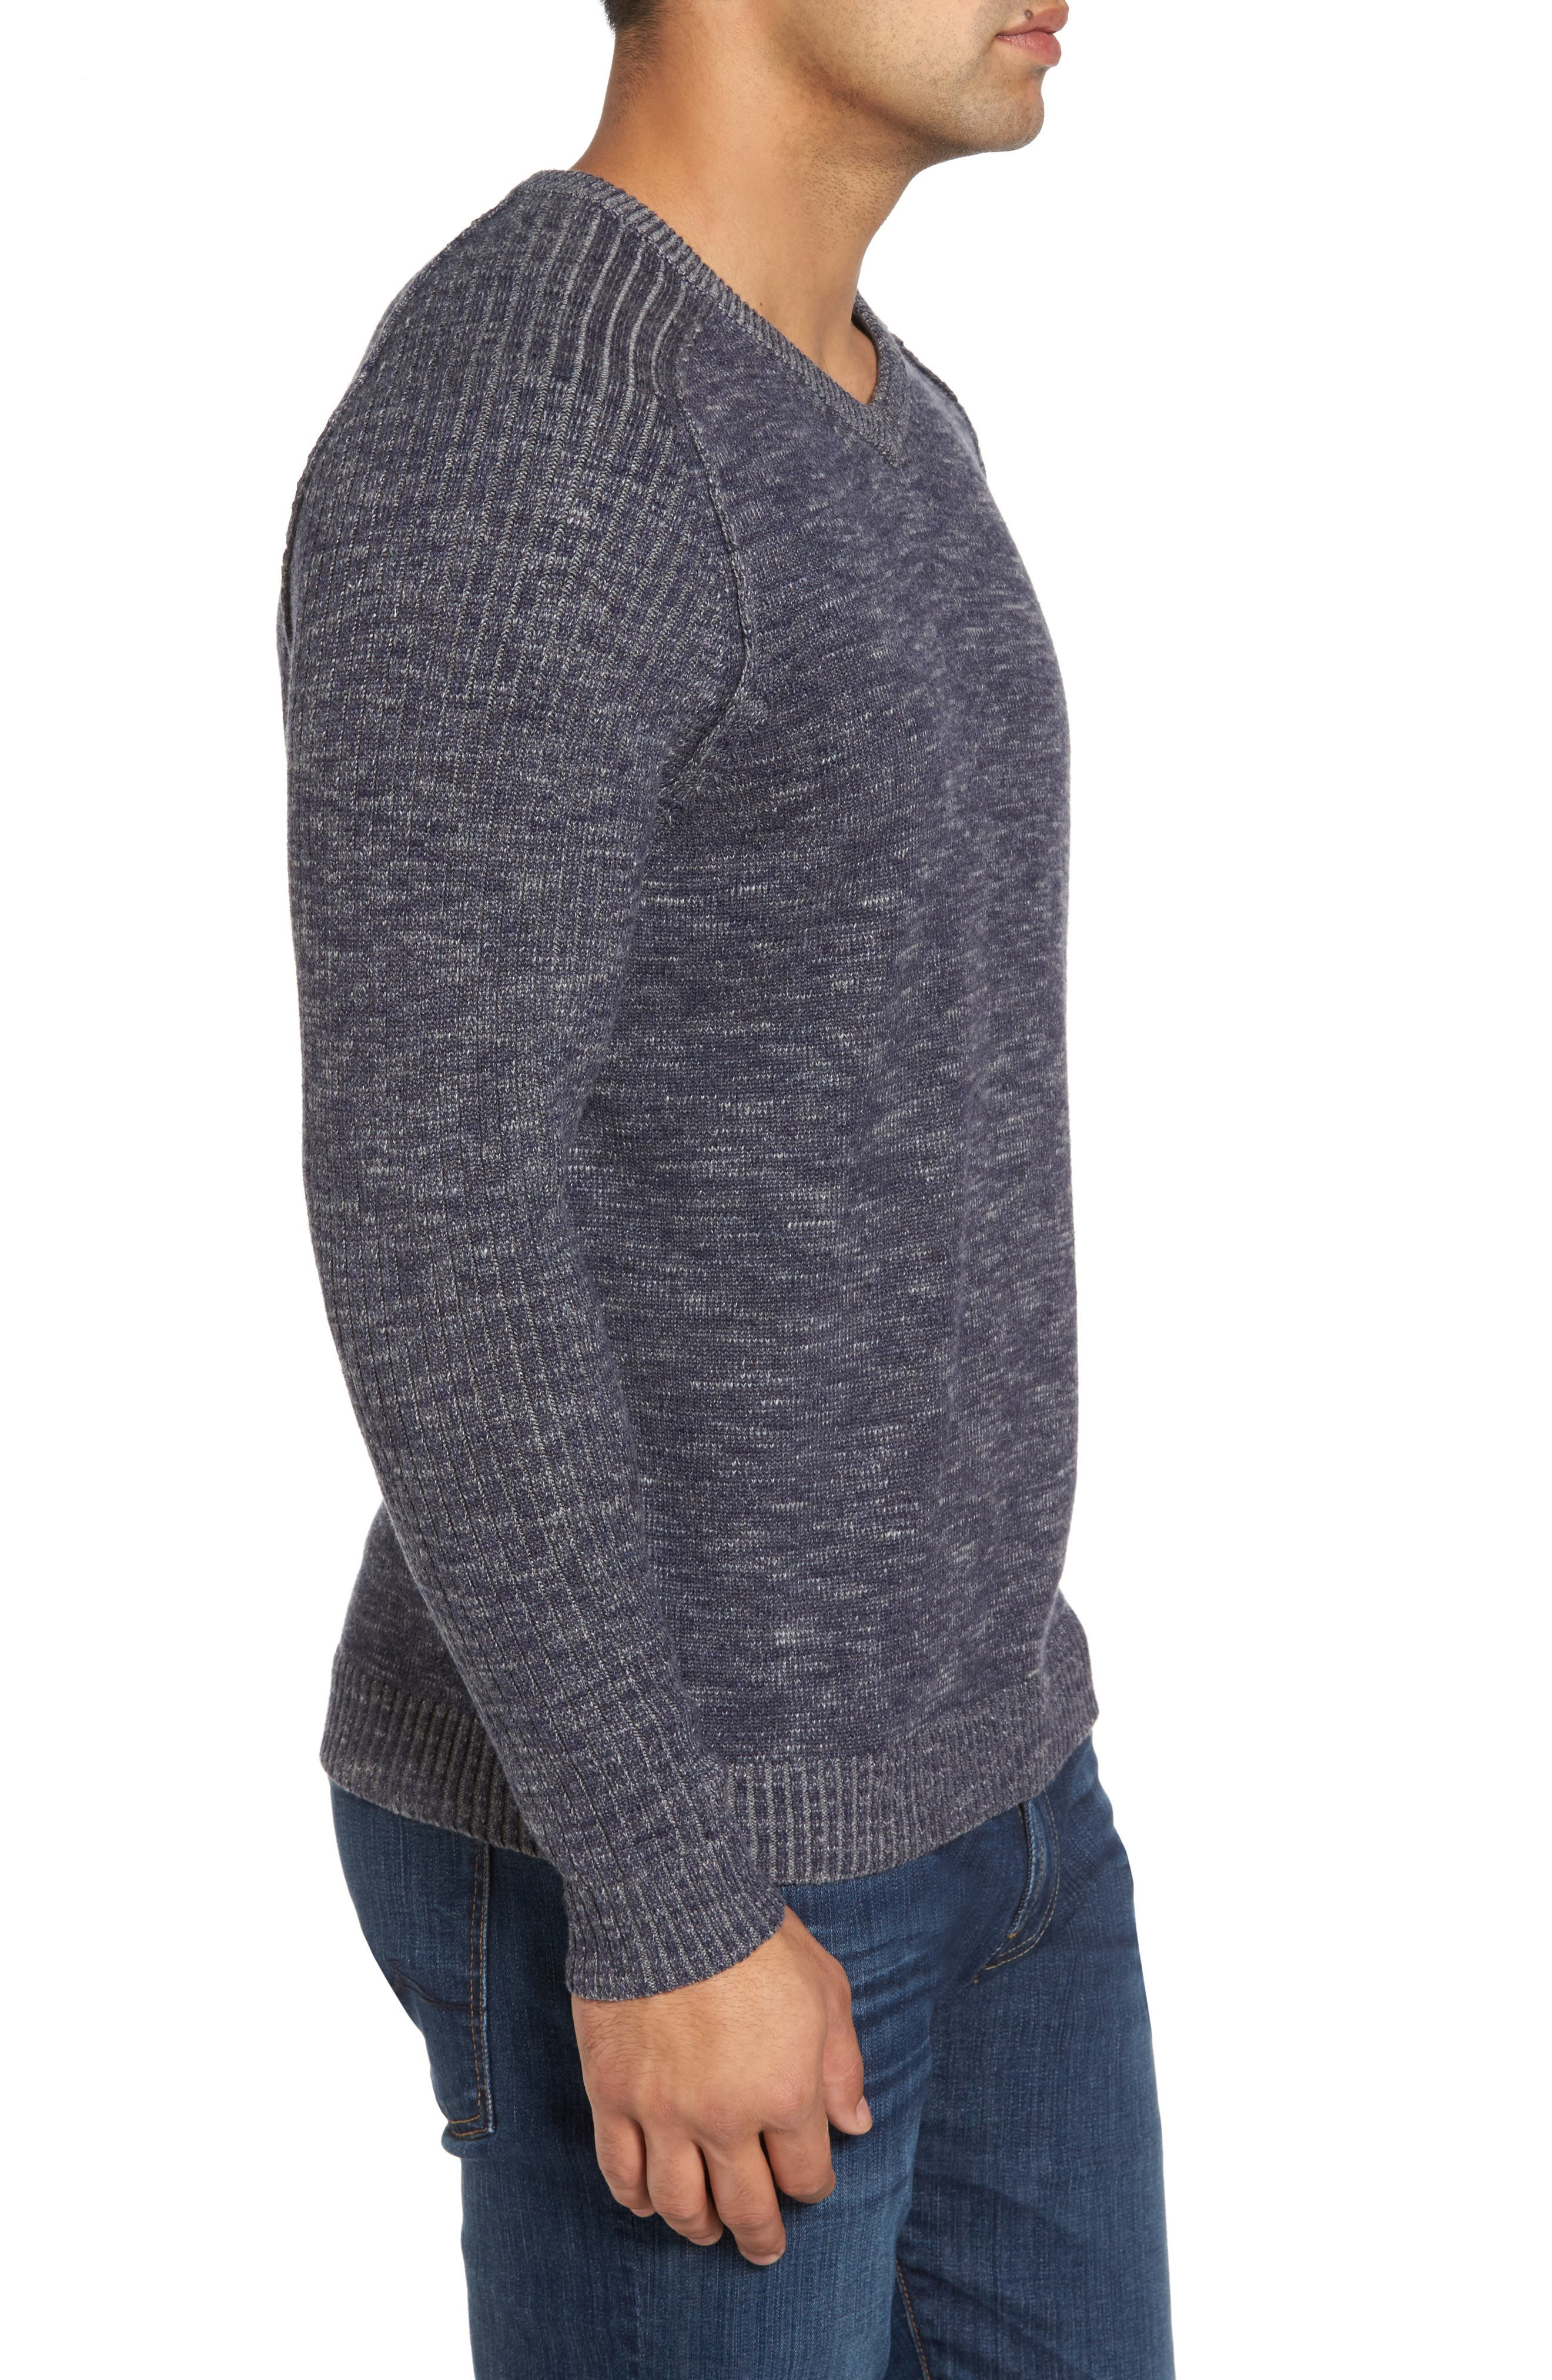 Gran Rey Flip Reversible Cotton & Wool Sweater,                             Alternate thumbnail 3, color,                             Ocean Deep Heather